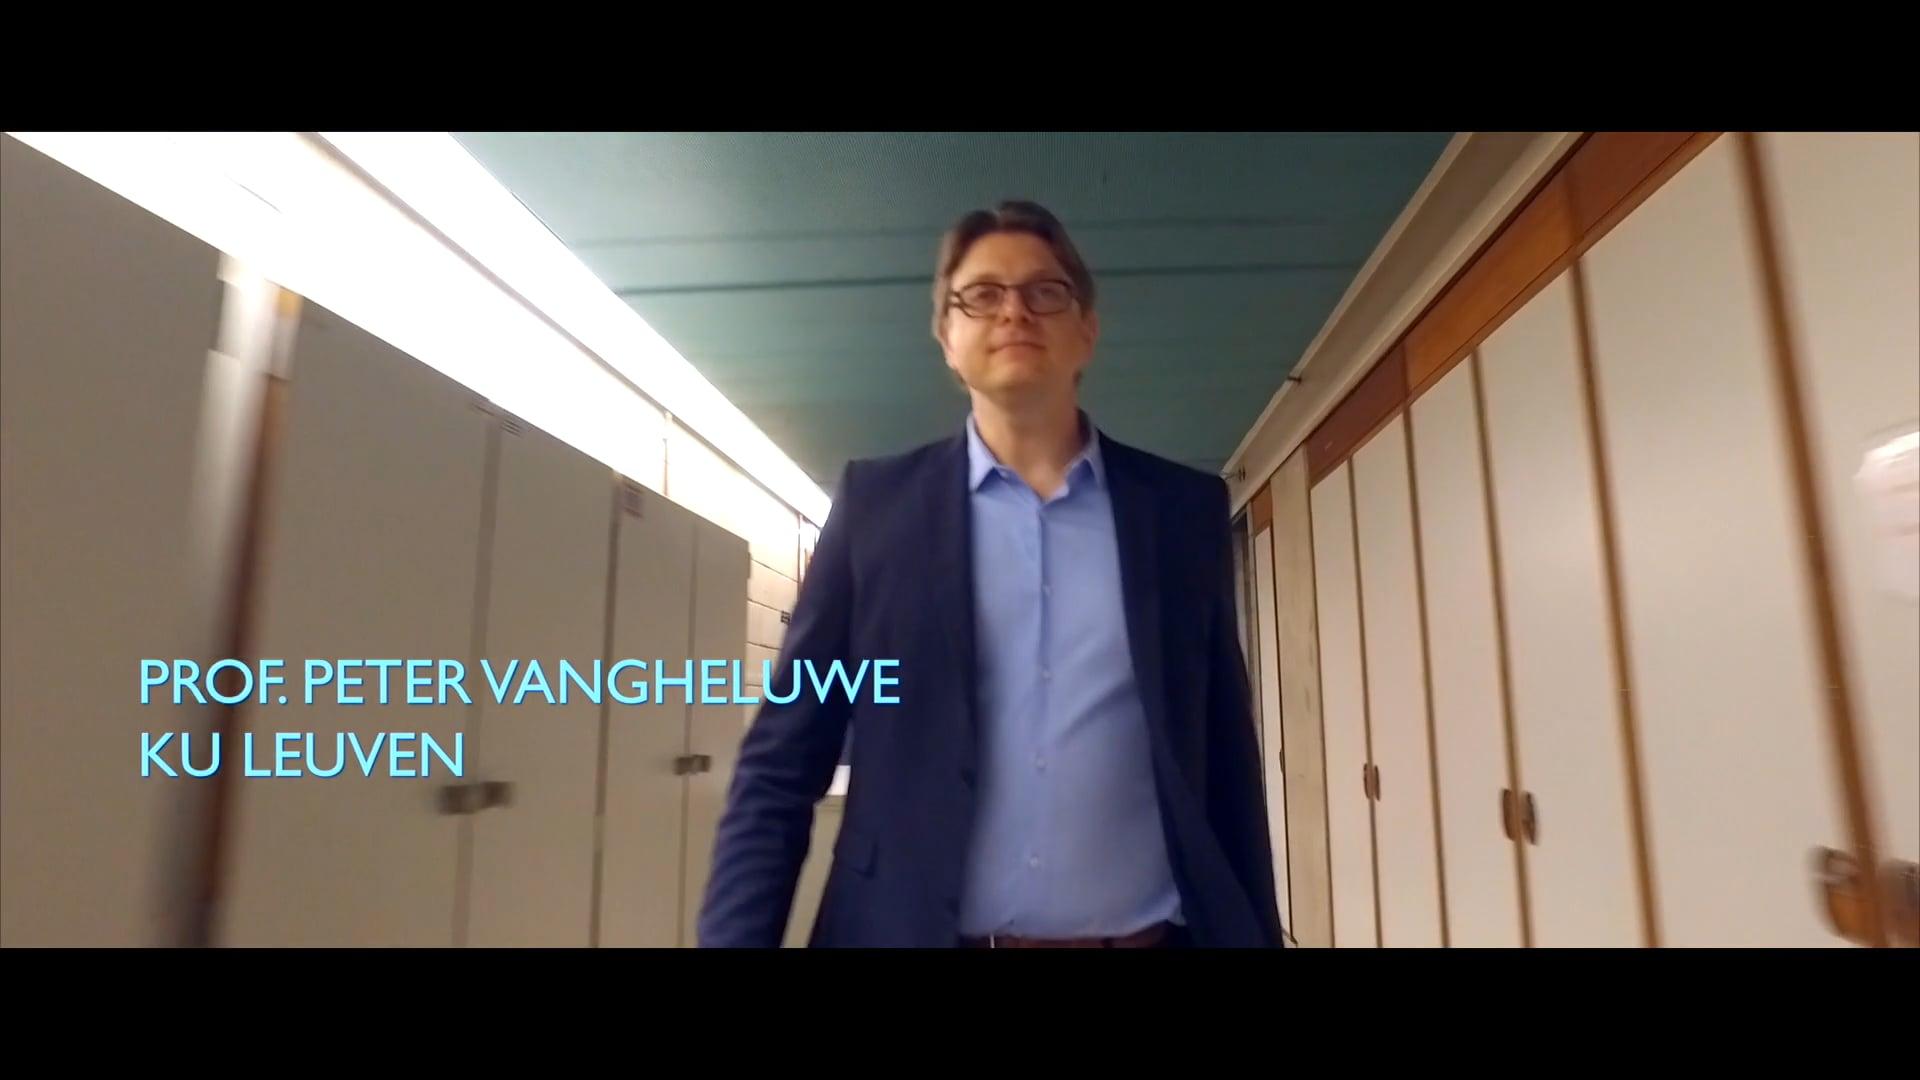 GSKE_PETER_VANGHELUWE